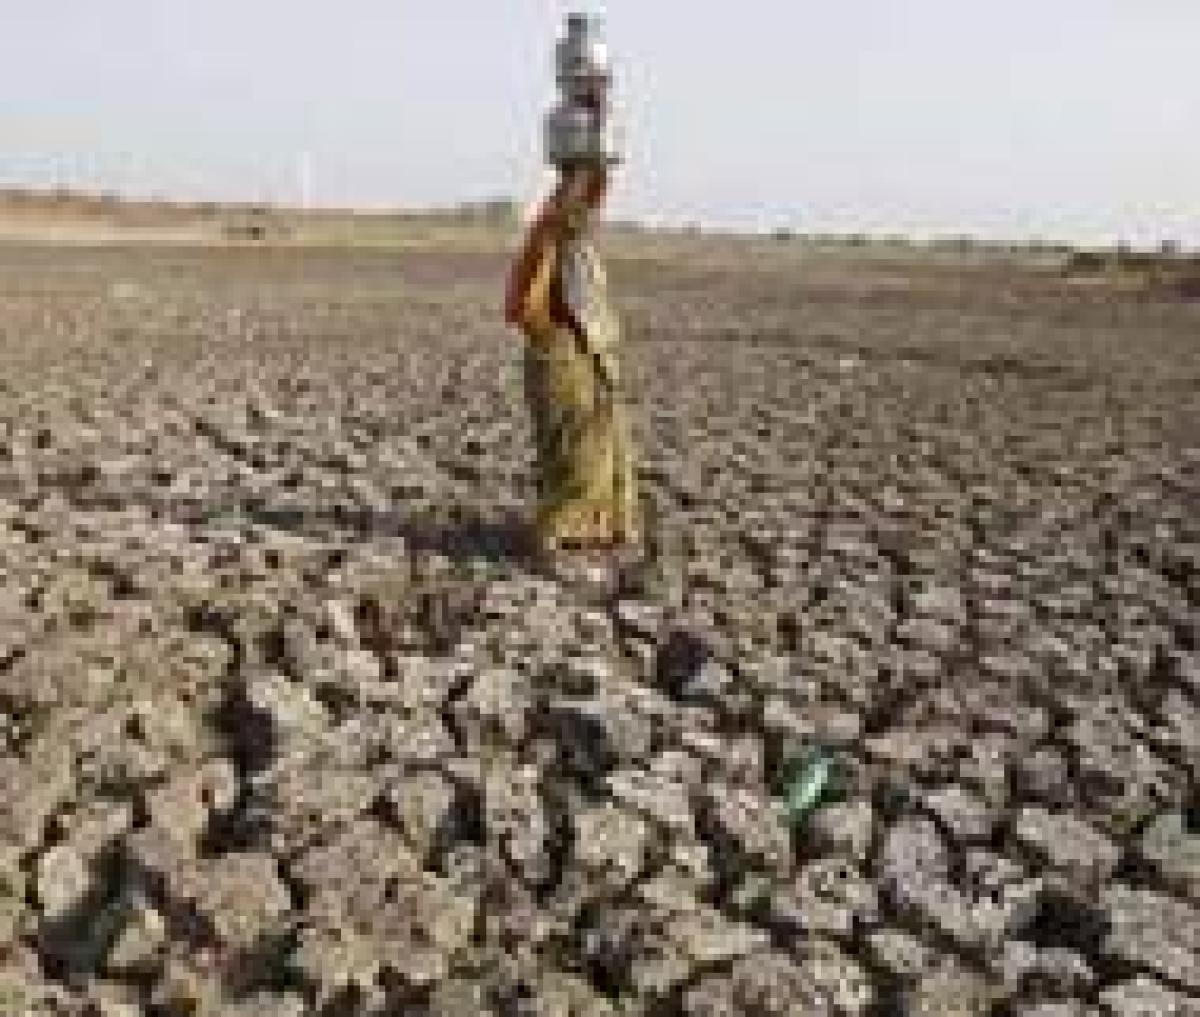 Experts warns Marathwada heading towards 'desertification'